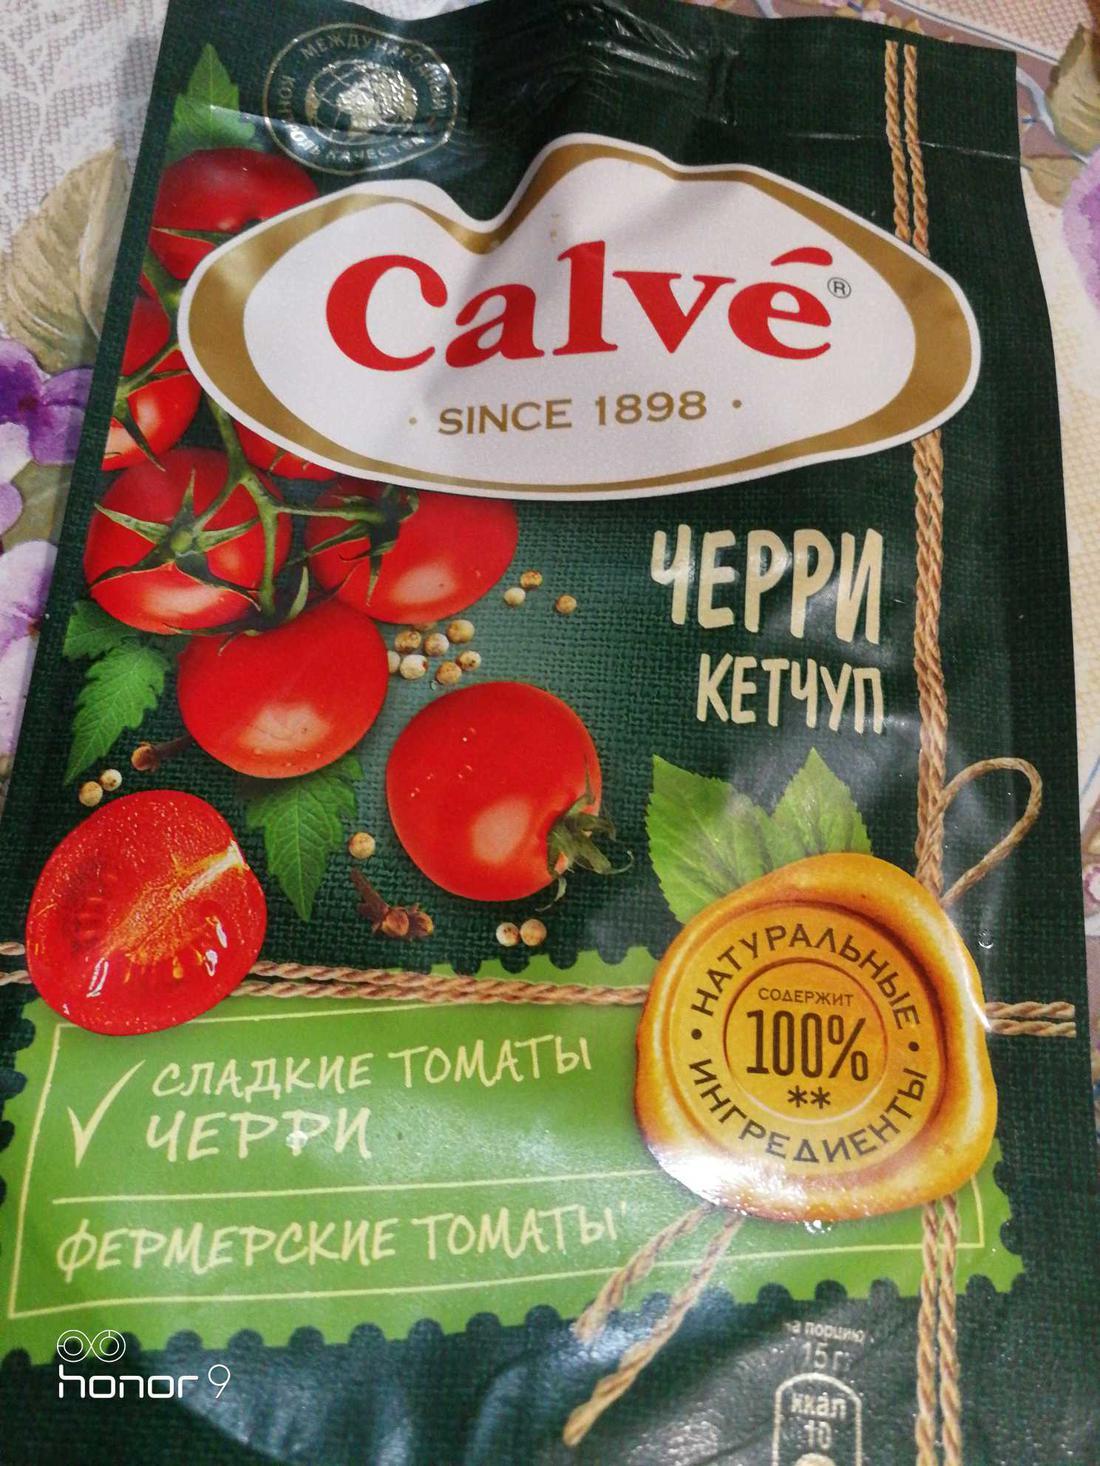 фото Calve кетчуп с помидорами Черри 350 г.